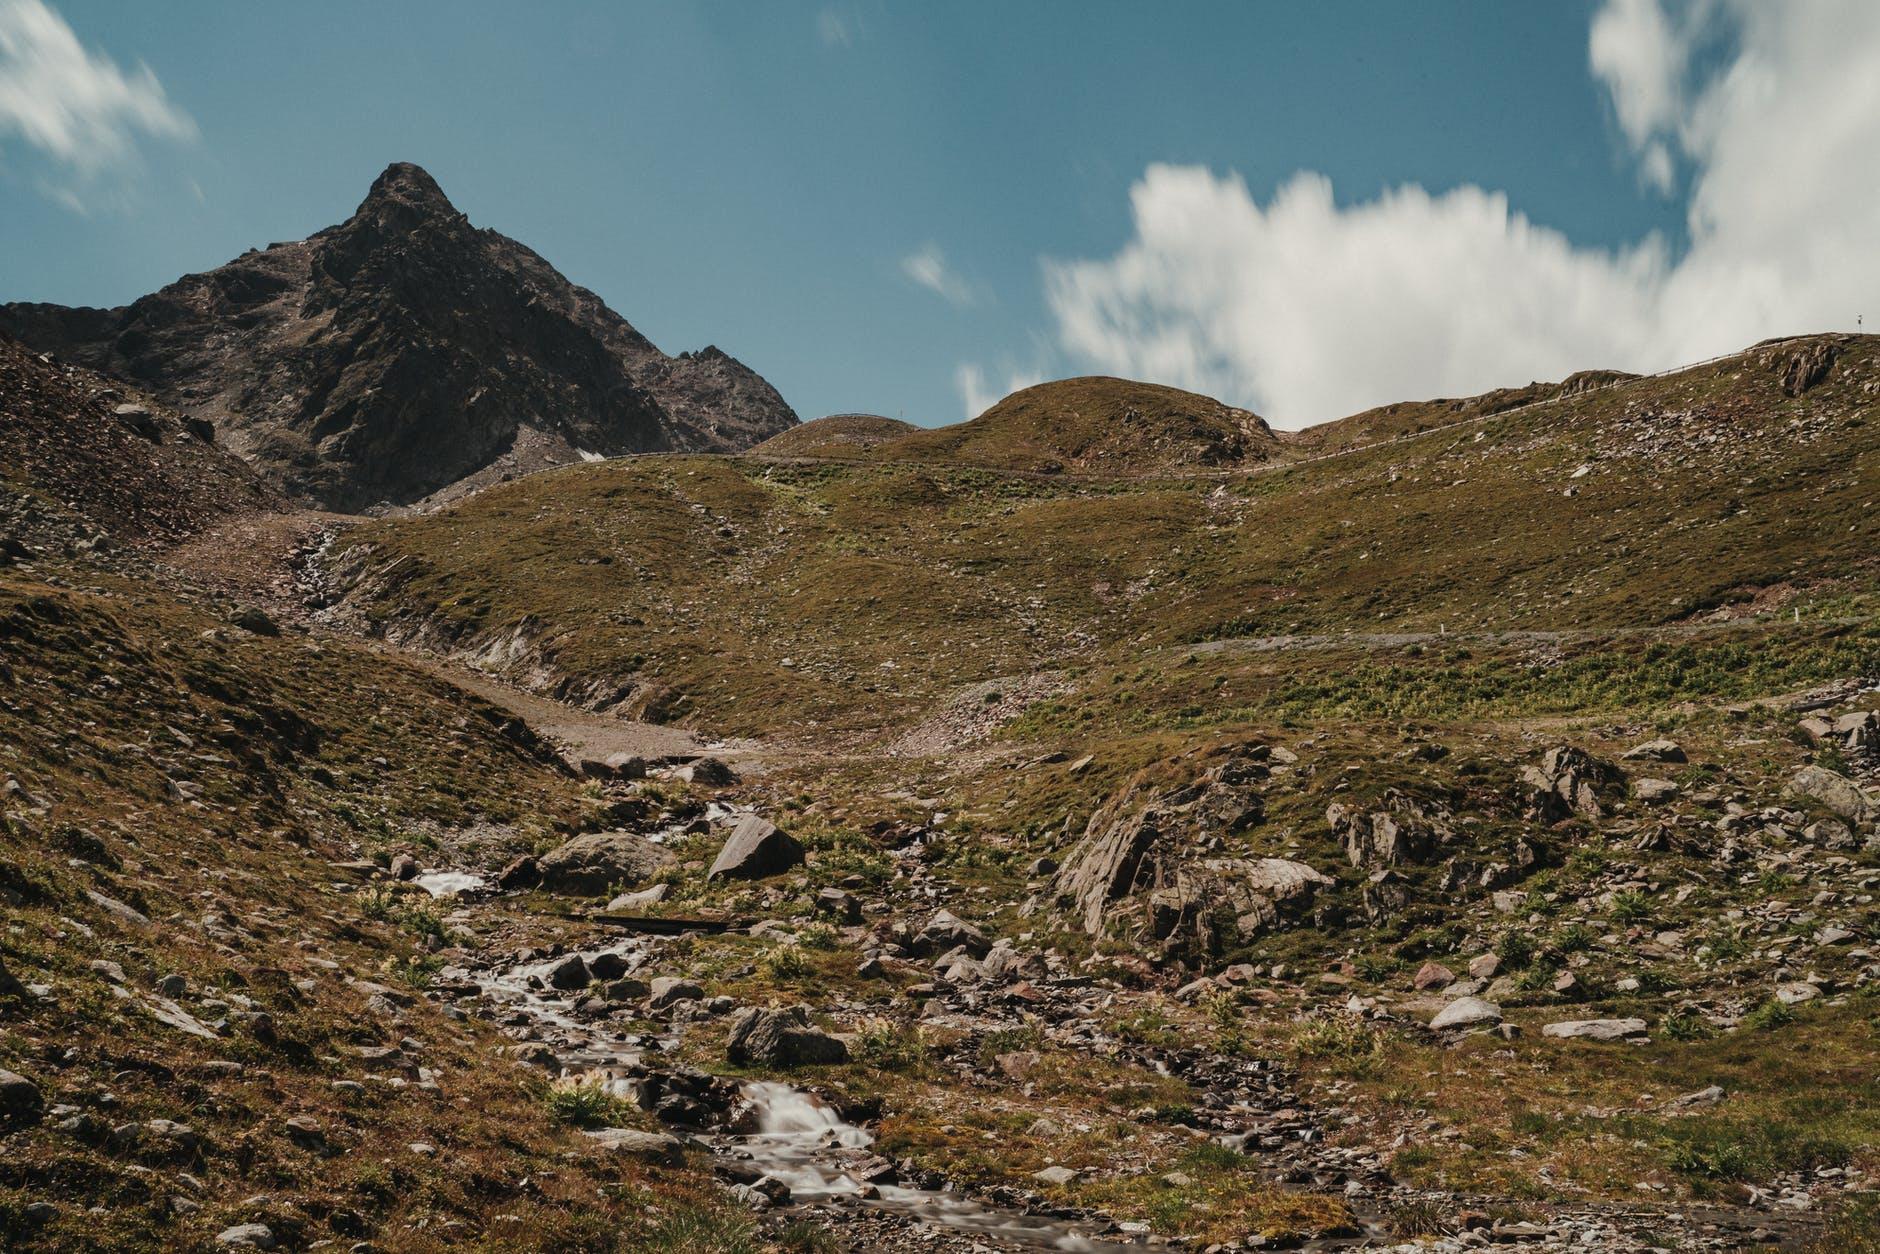 rocky terrain with high mountain